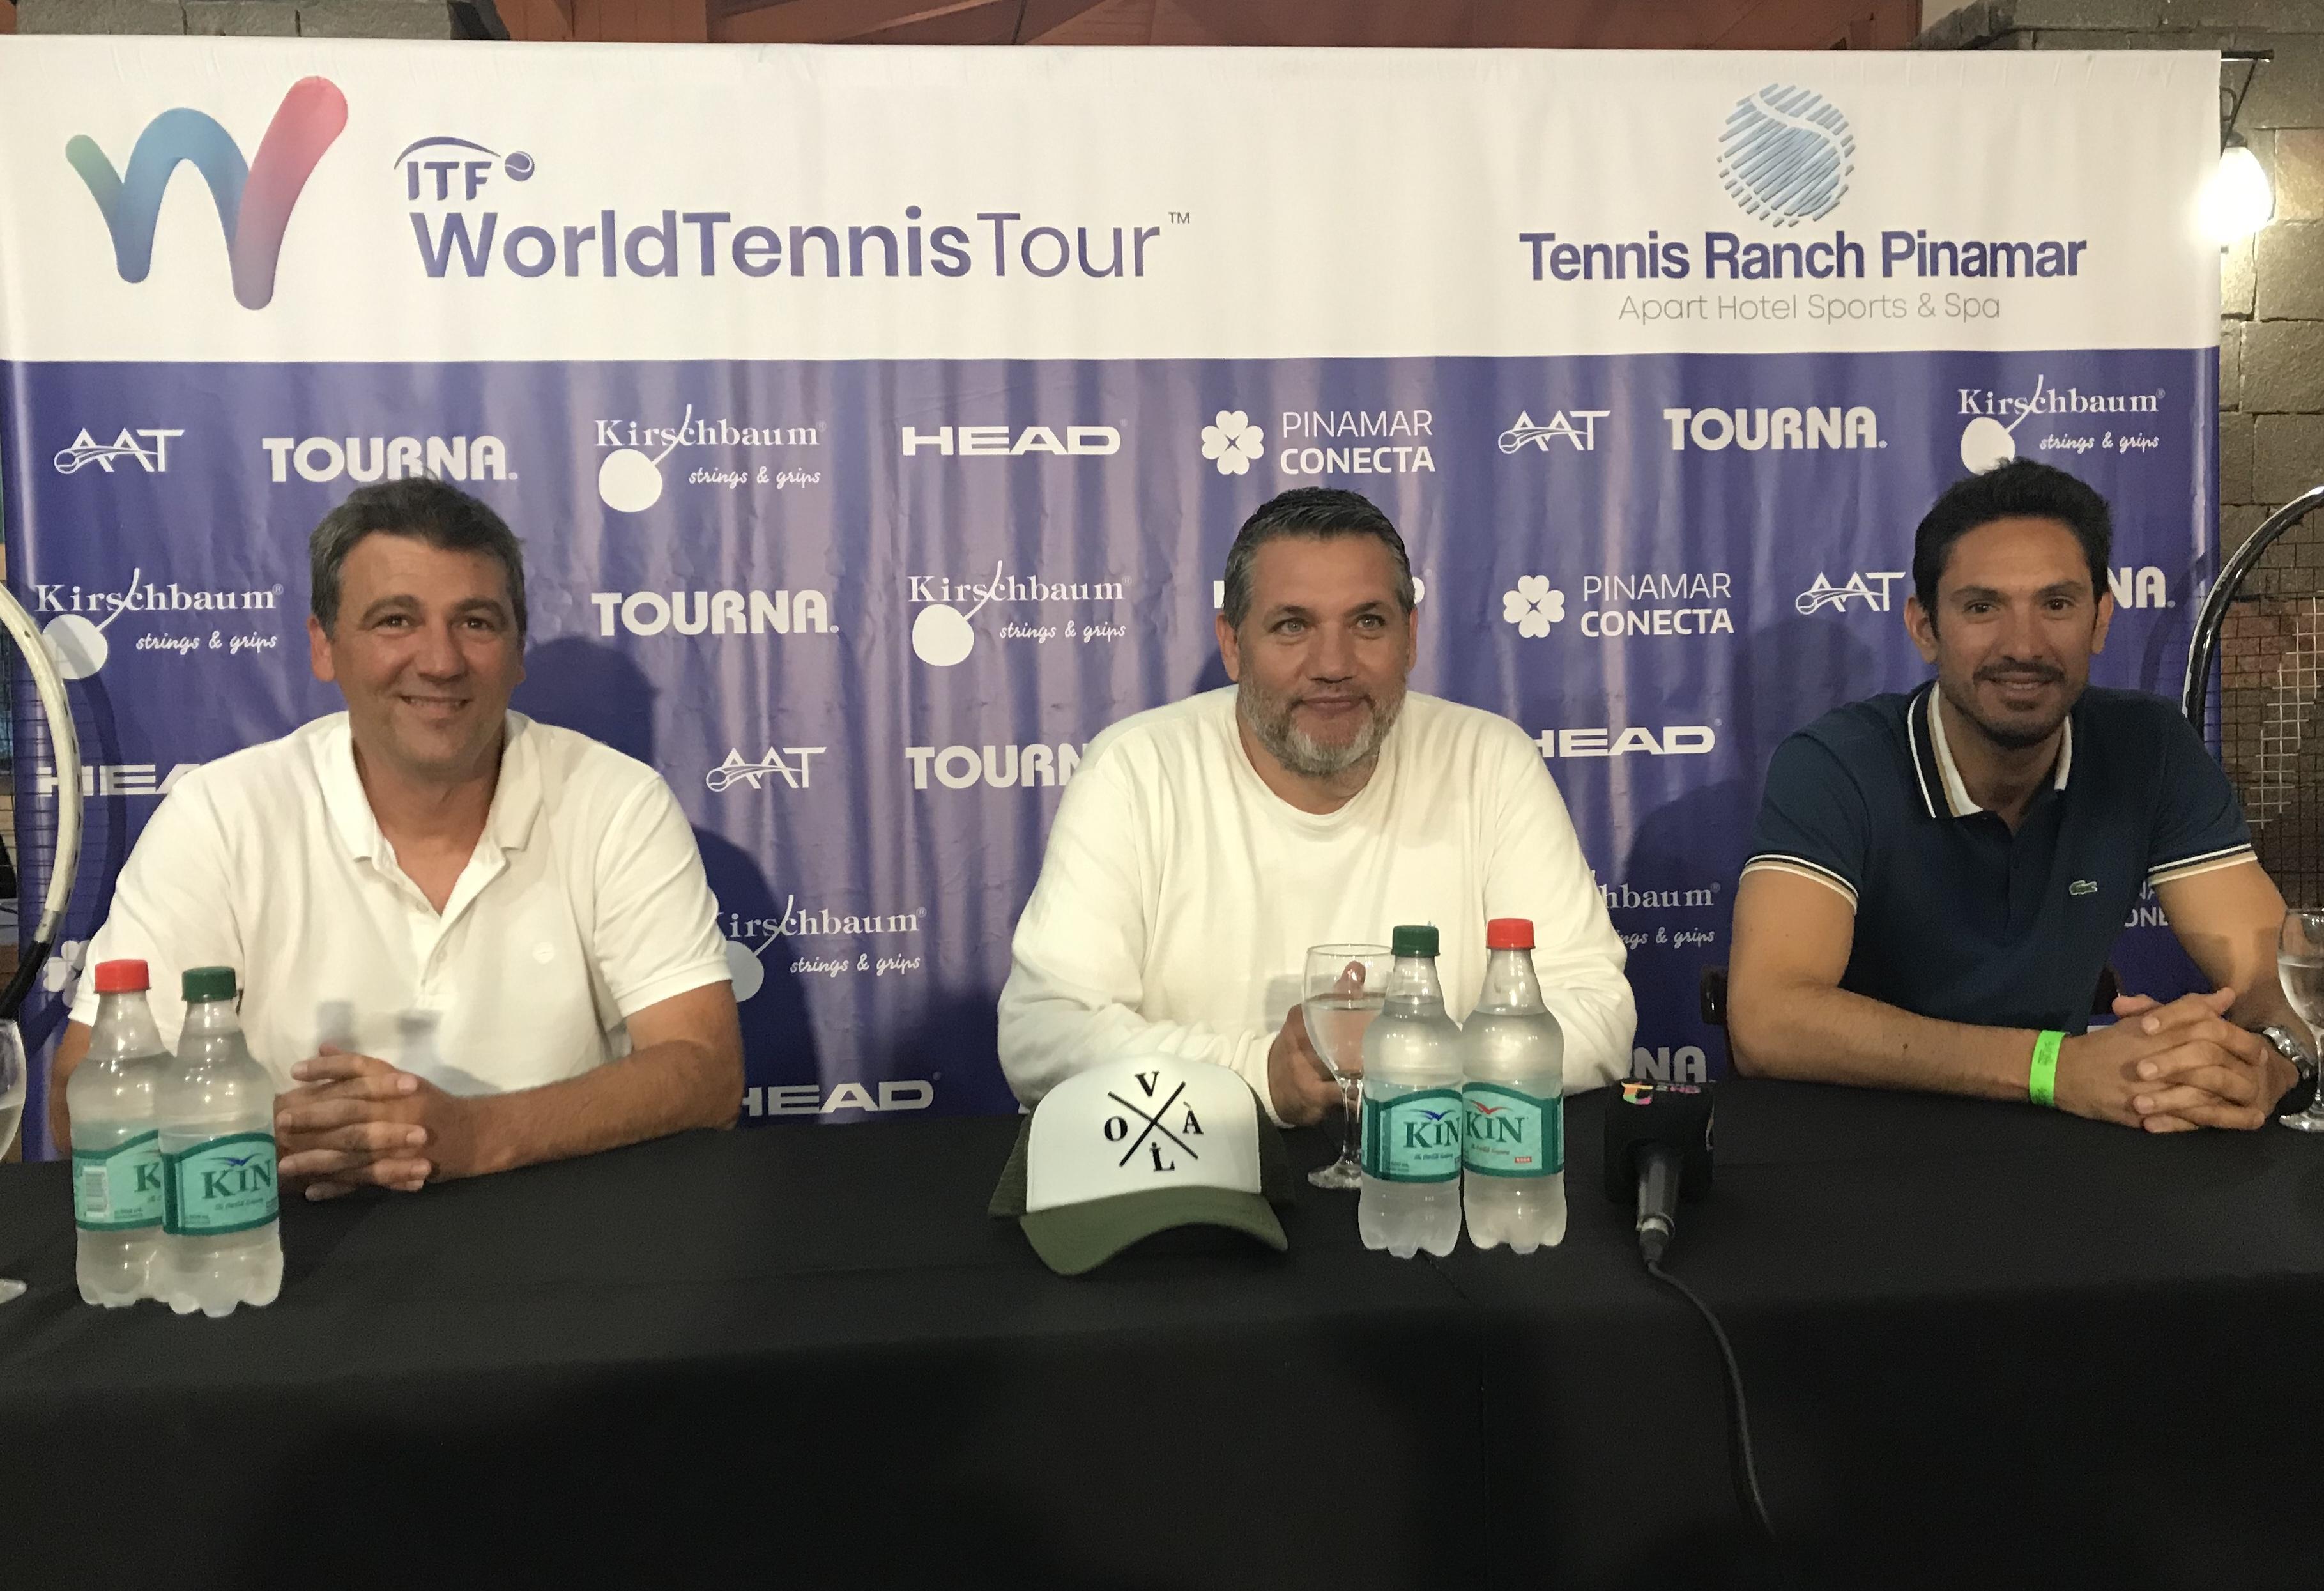 Calendario Itf.Se Presentaron Los 21 Torneos Del Itf World Tennis Tour 2019